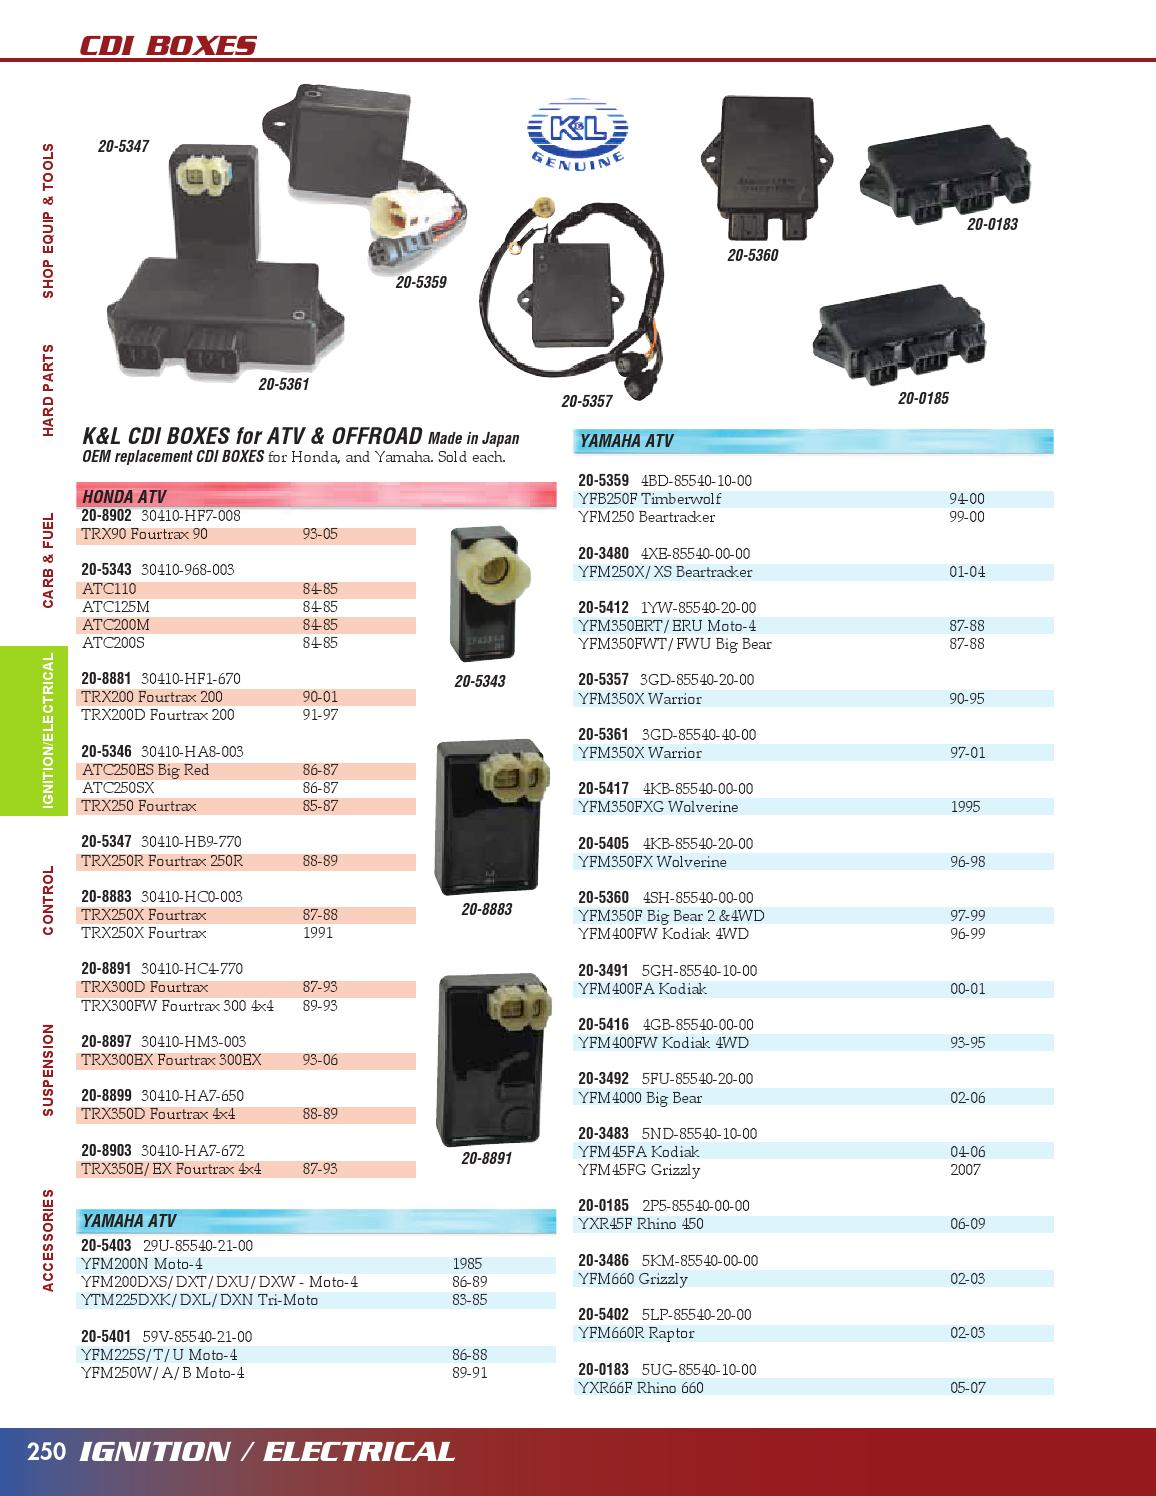 CDI For Yamaha YFM 225 88 YFM 250 Moto 4 89-91 59V-85540-21-00 59Y-85540-21-00 3